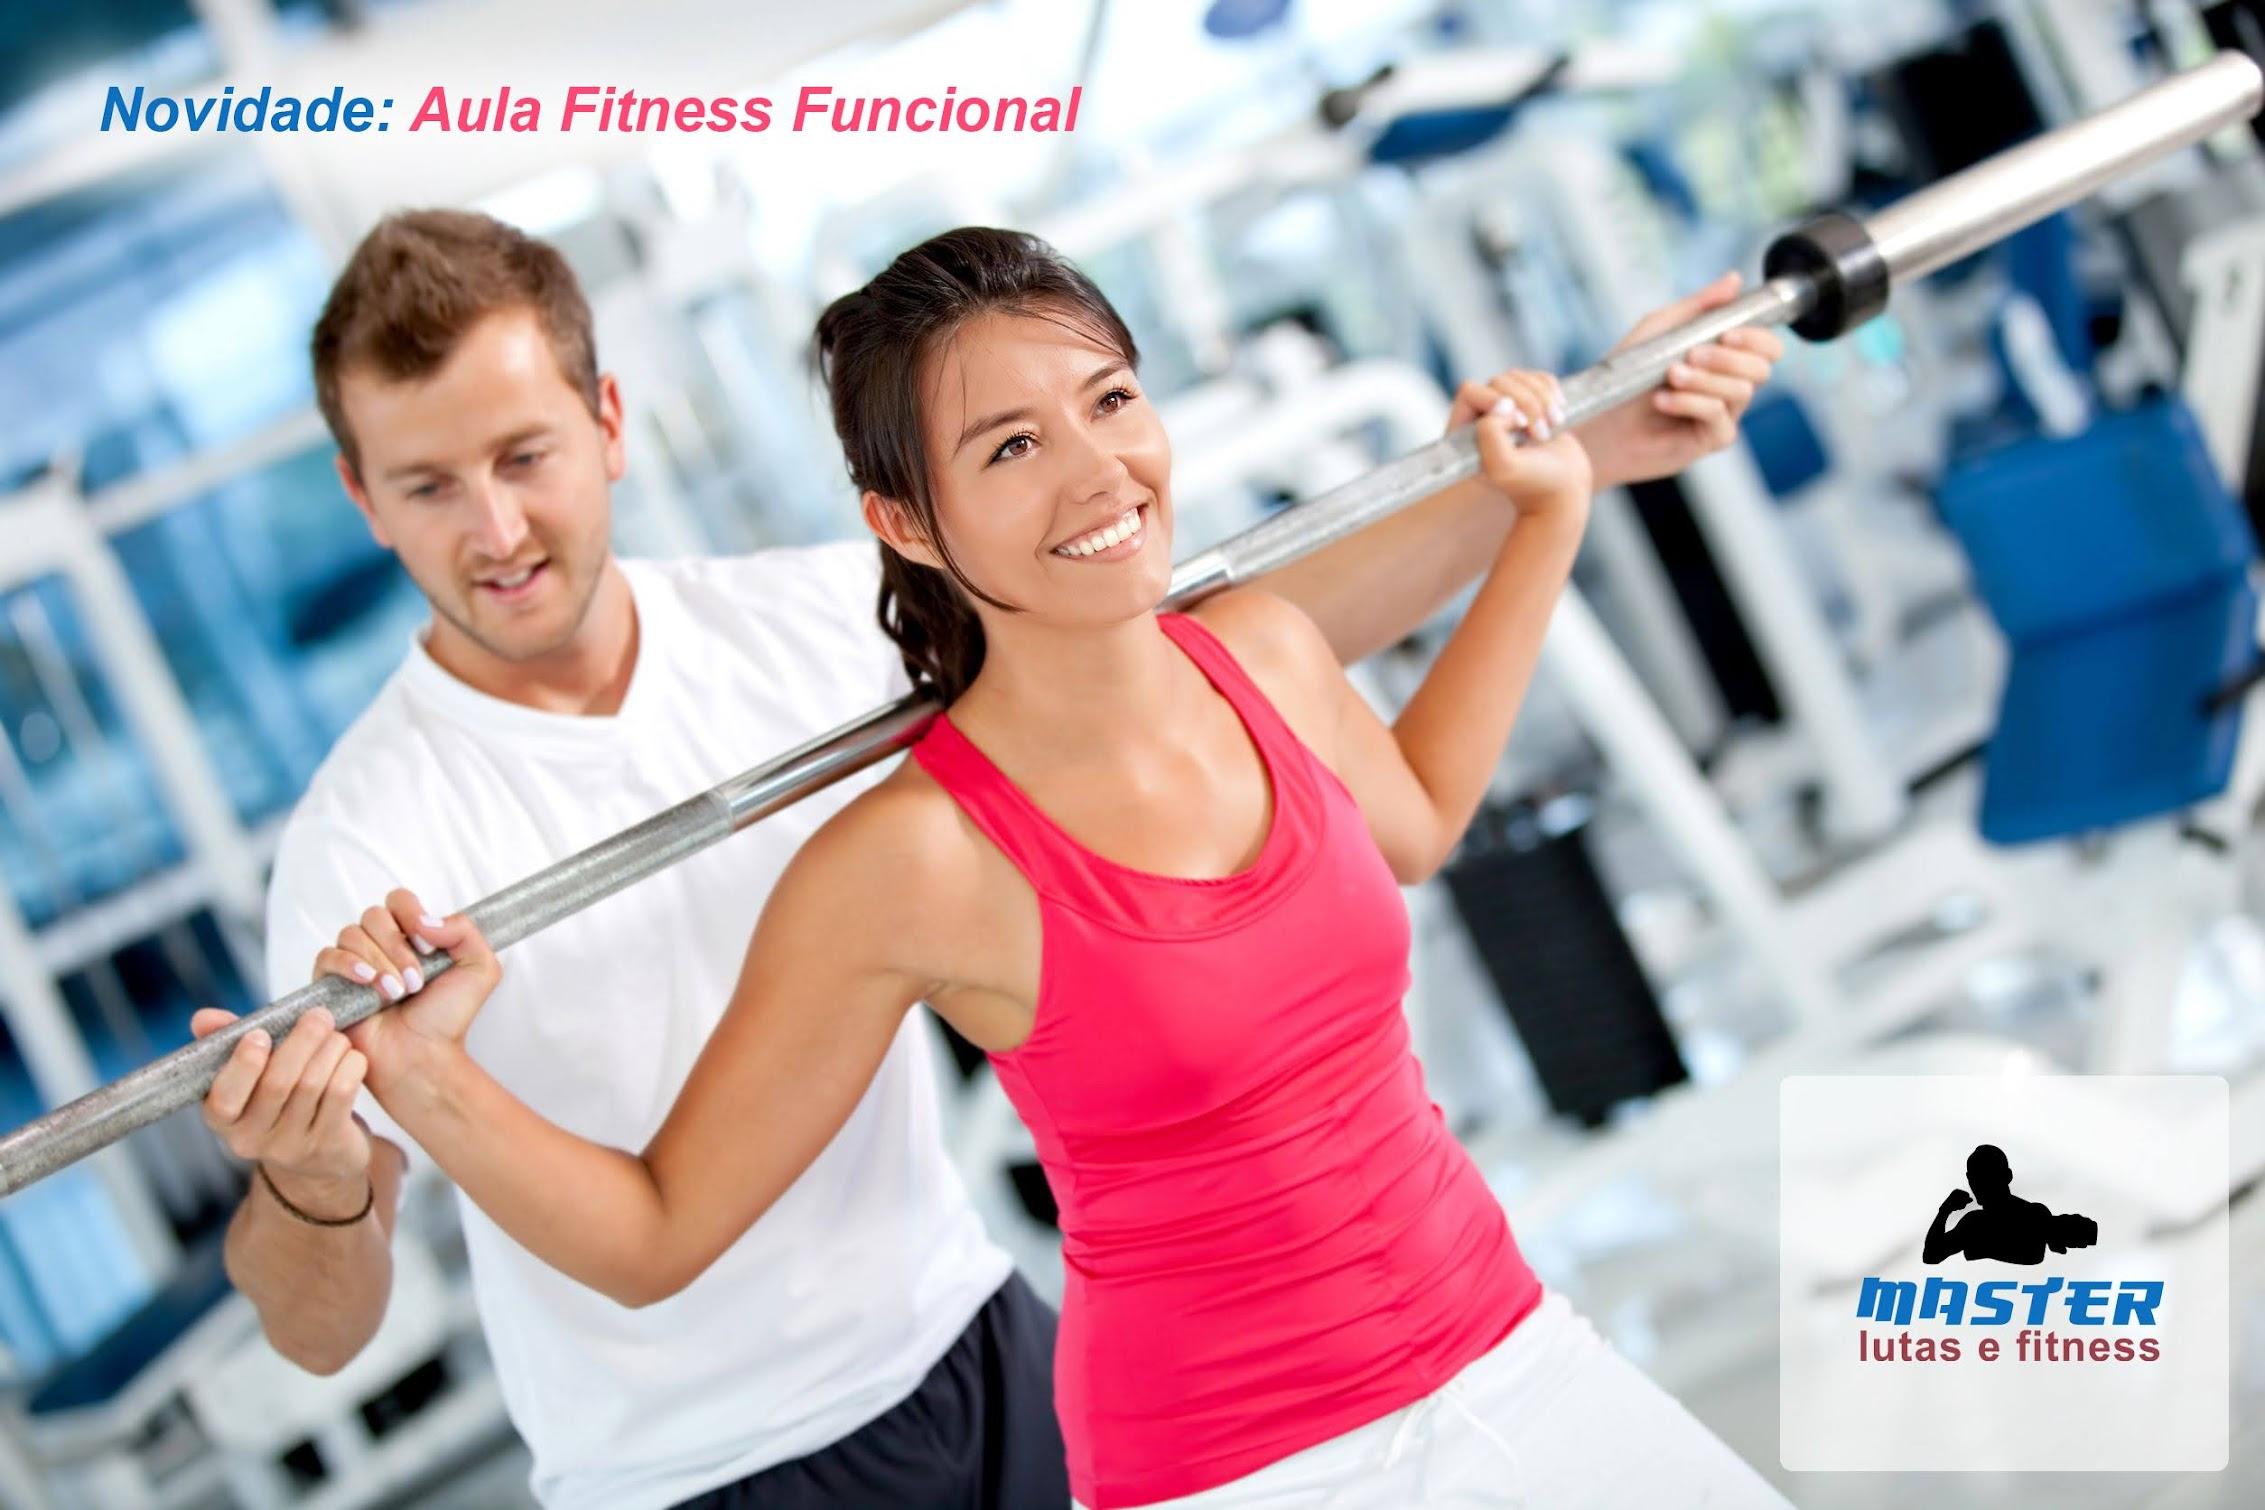 aula fitness funcional botafogo